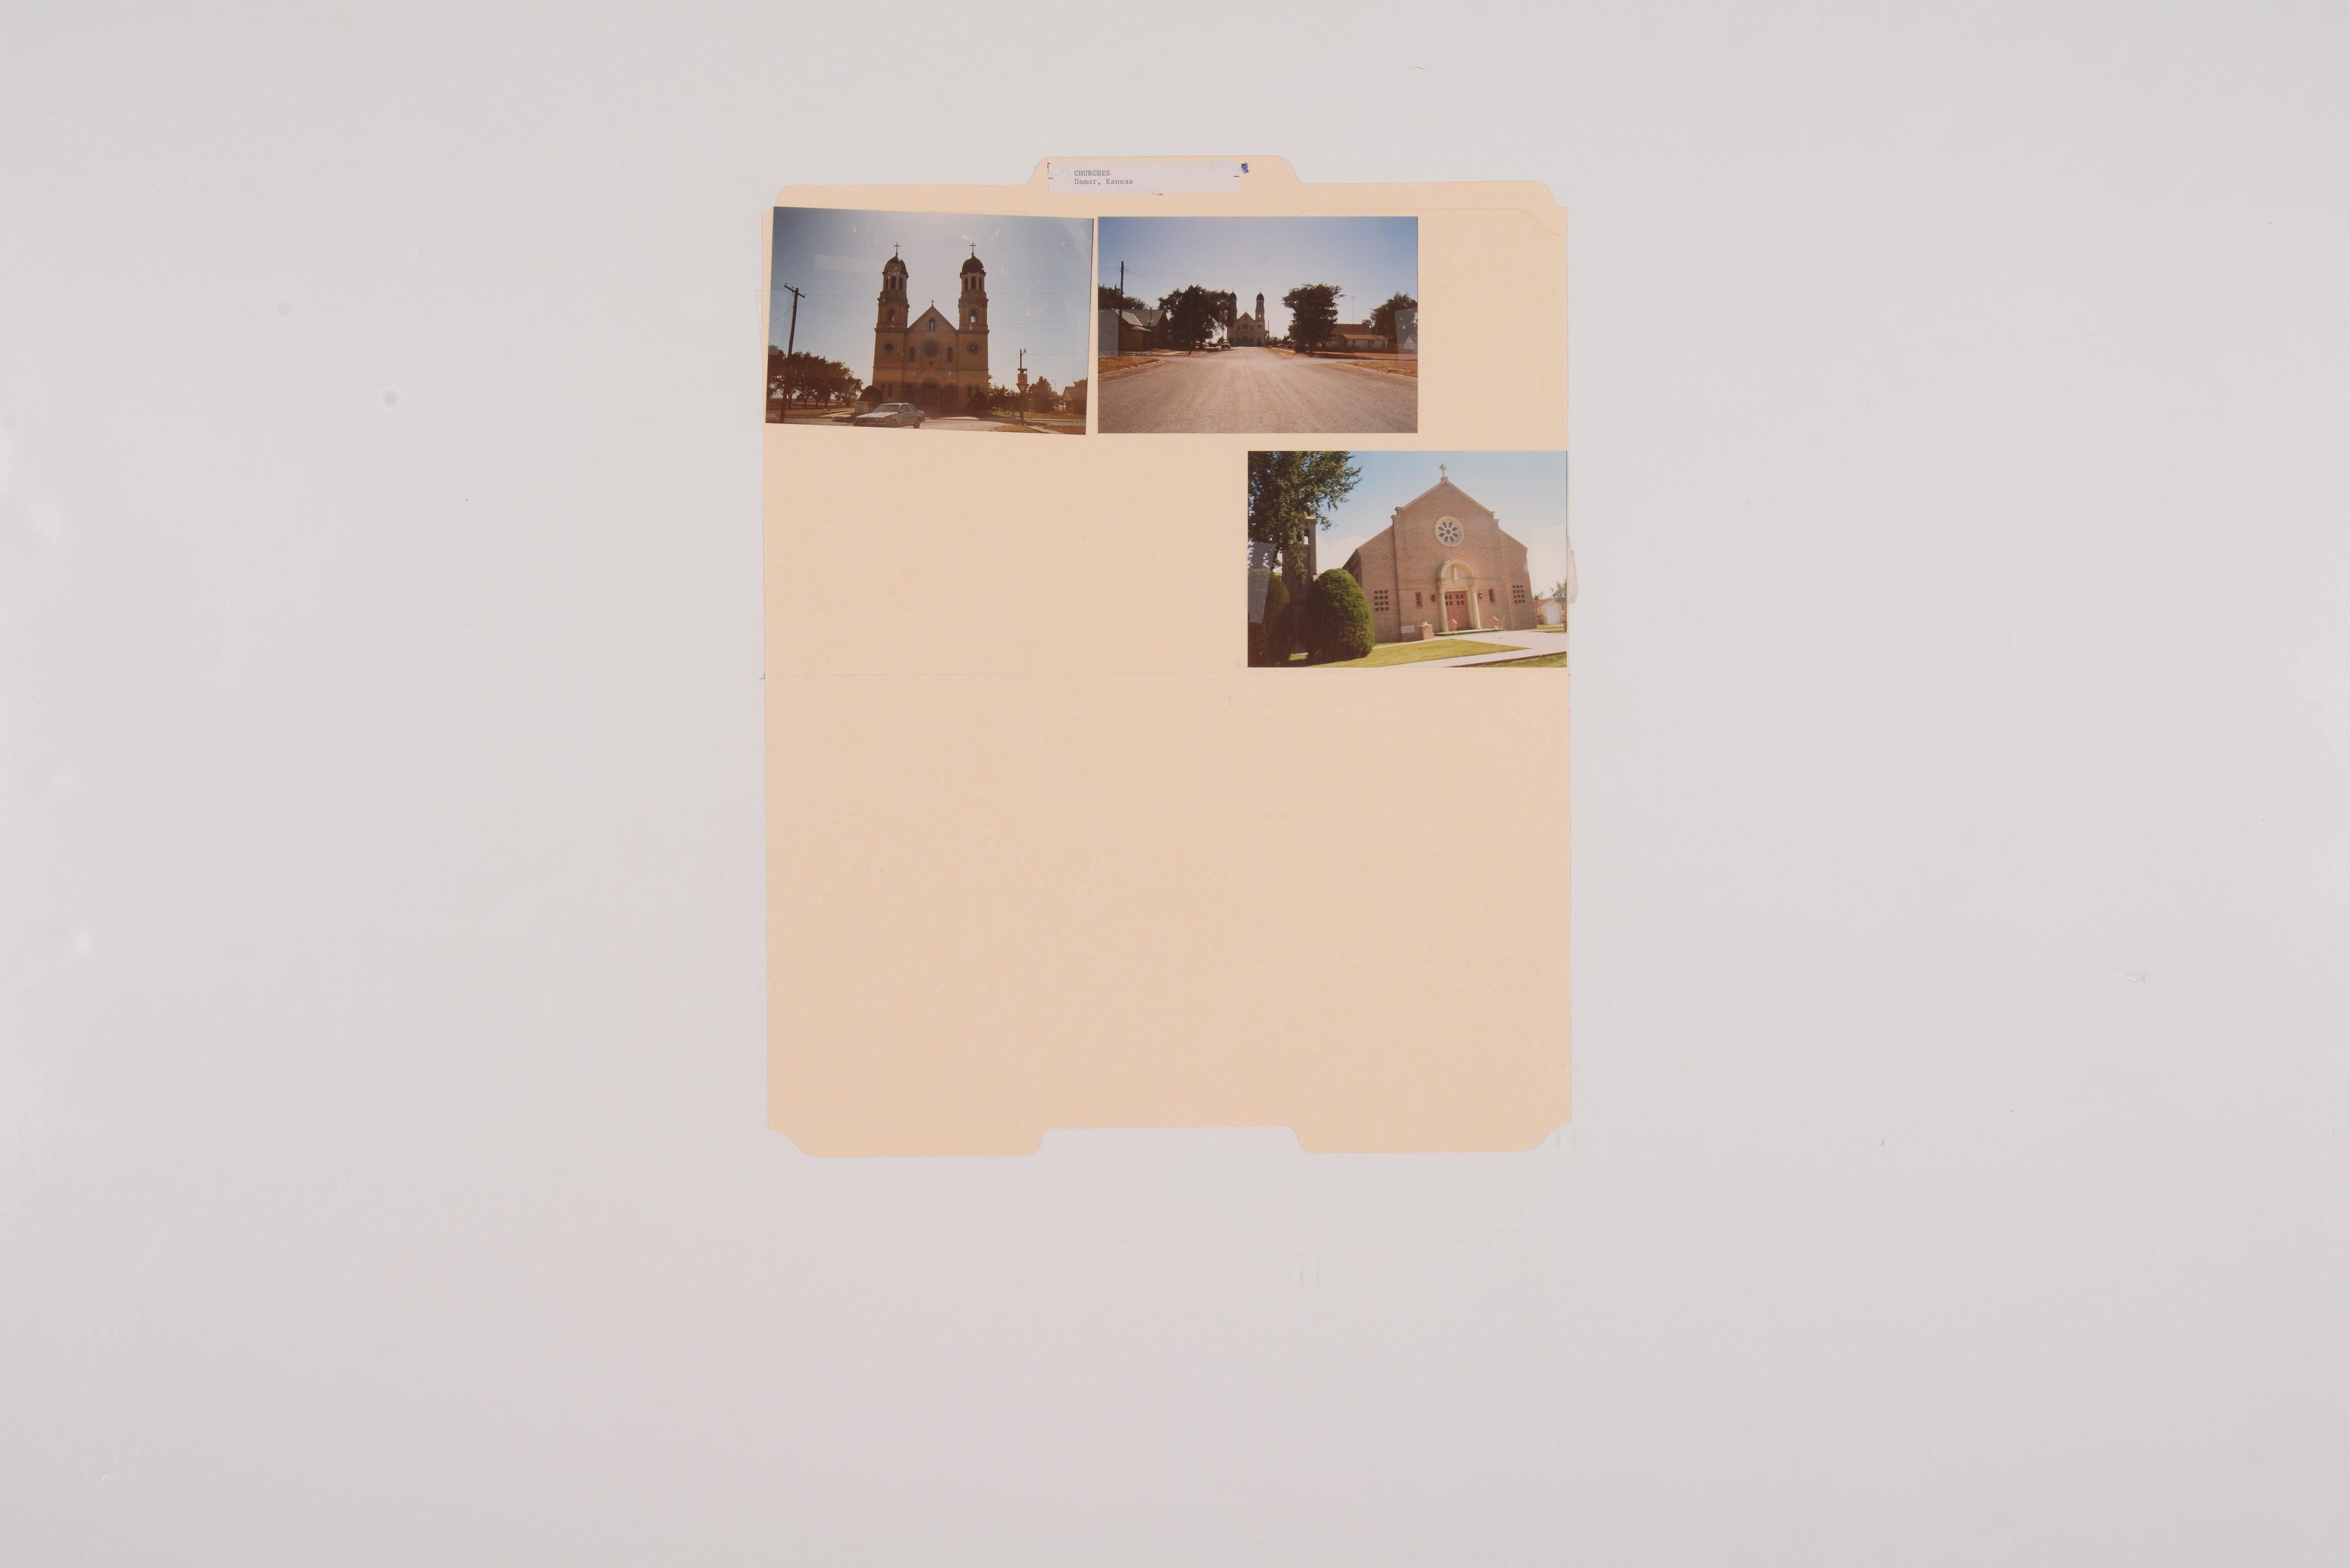 Kansas Film Commission site photographs, subject churches - 10